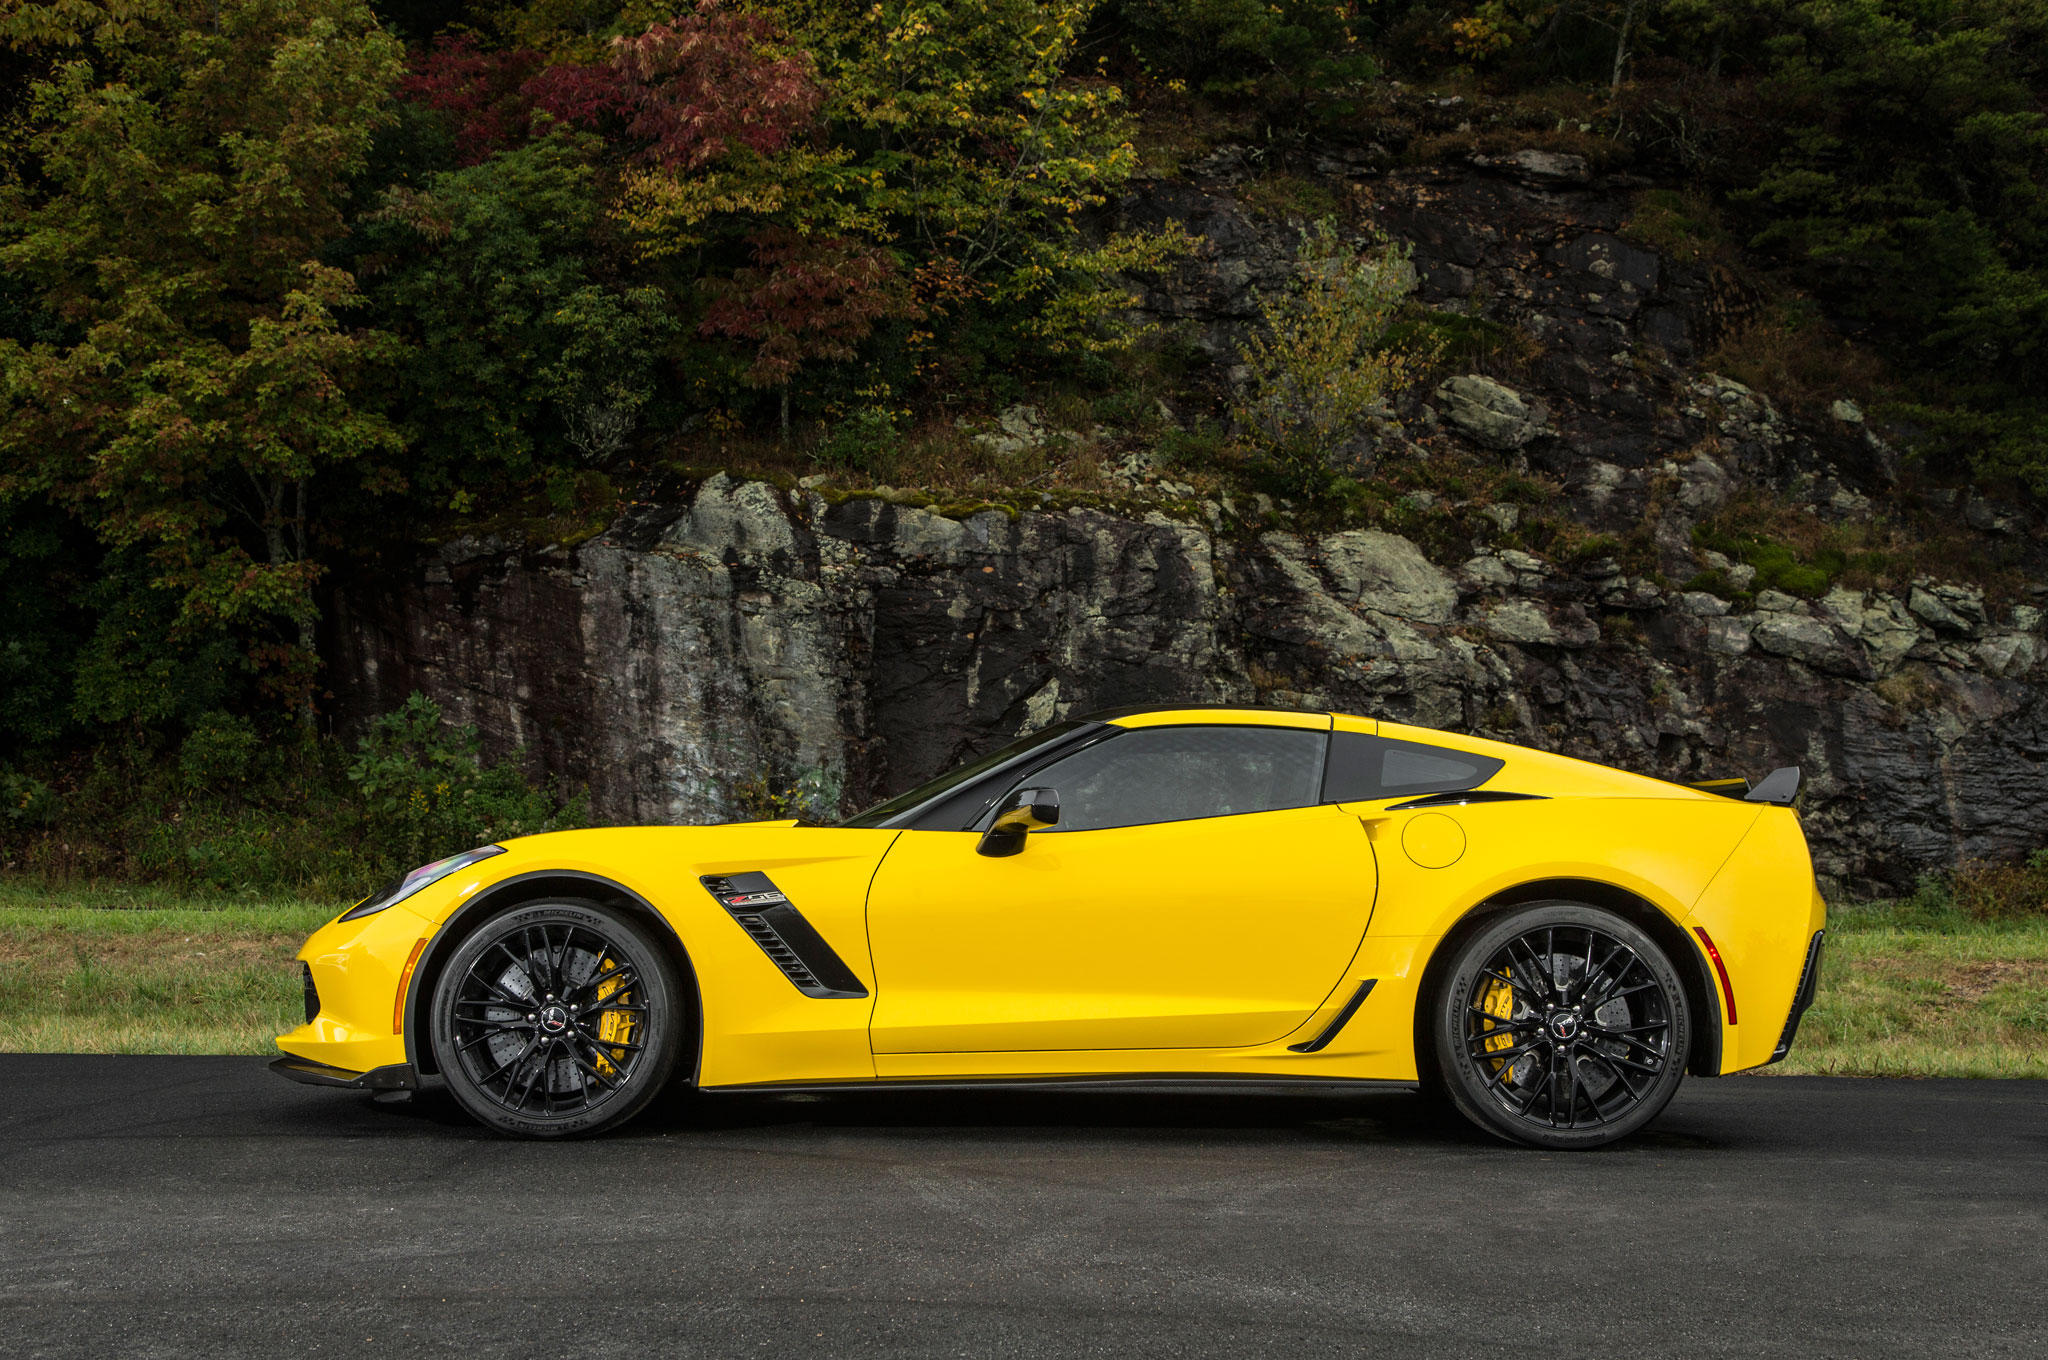 2015 Chevrolet Corvette Z06 Review.